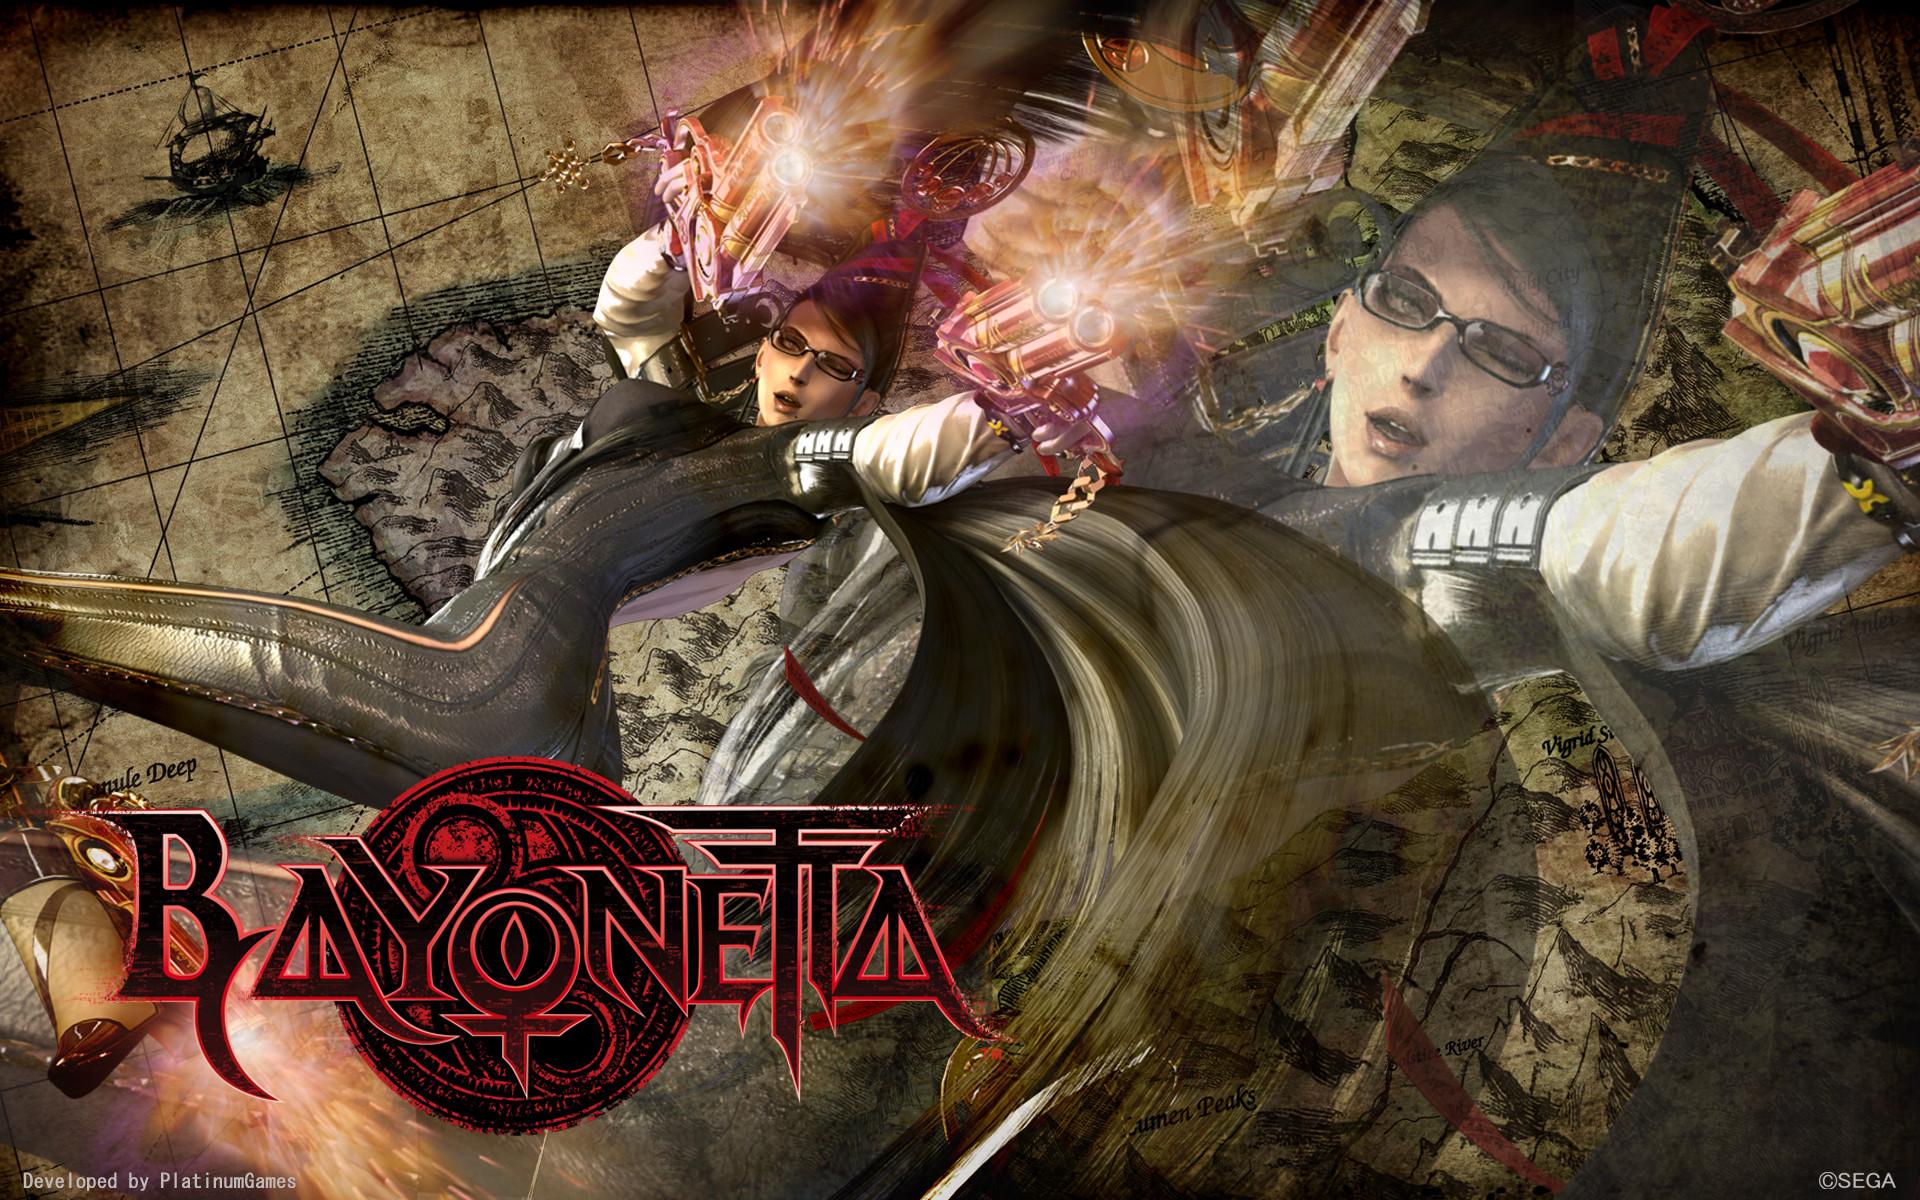 Bayonetta-wallpaper-10.jpg